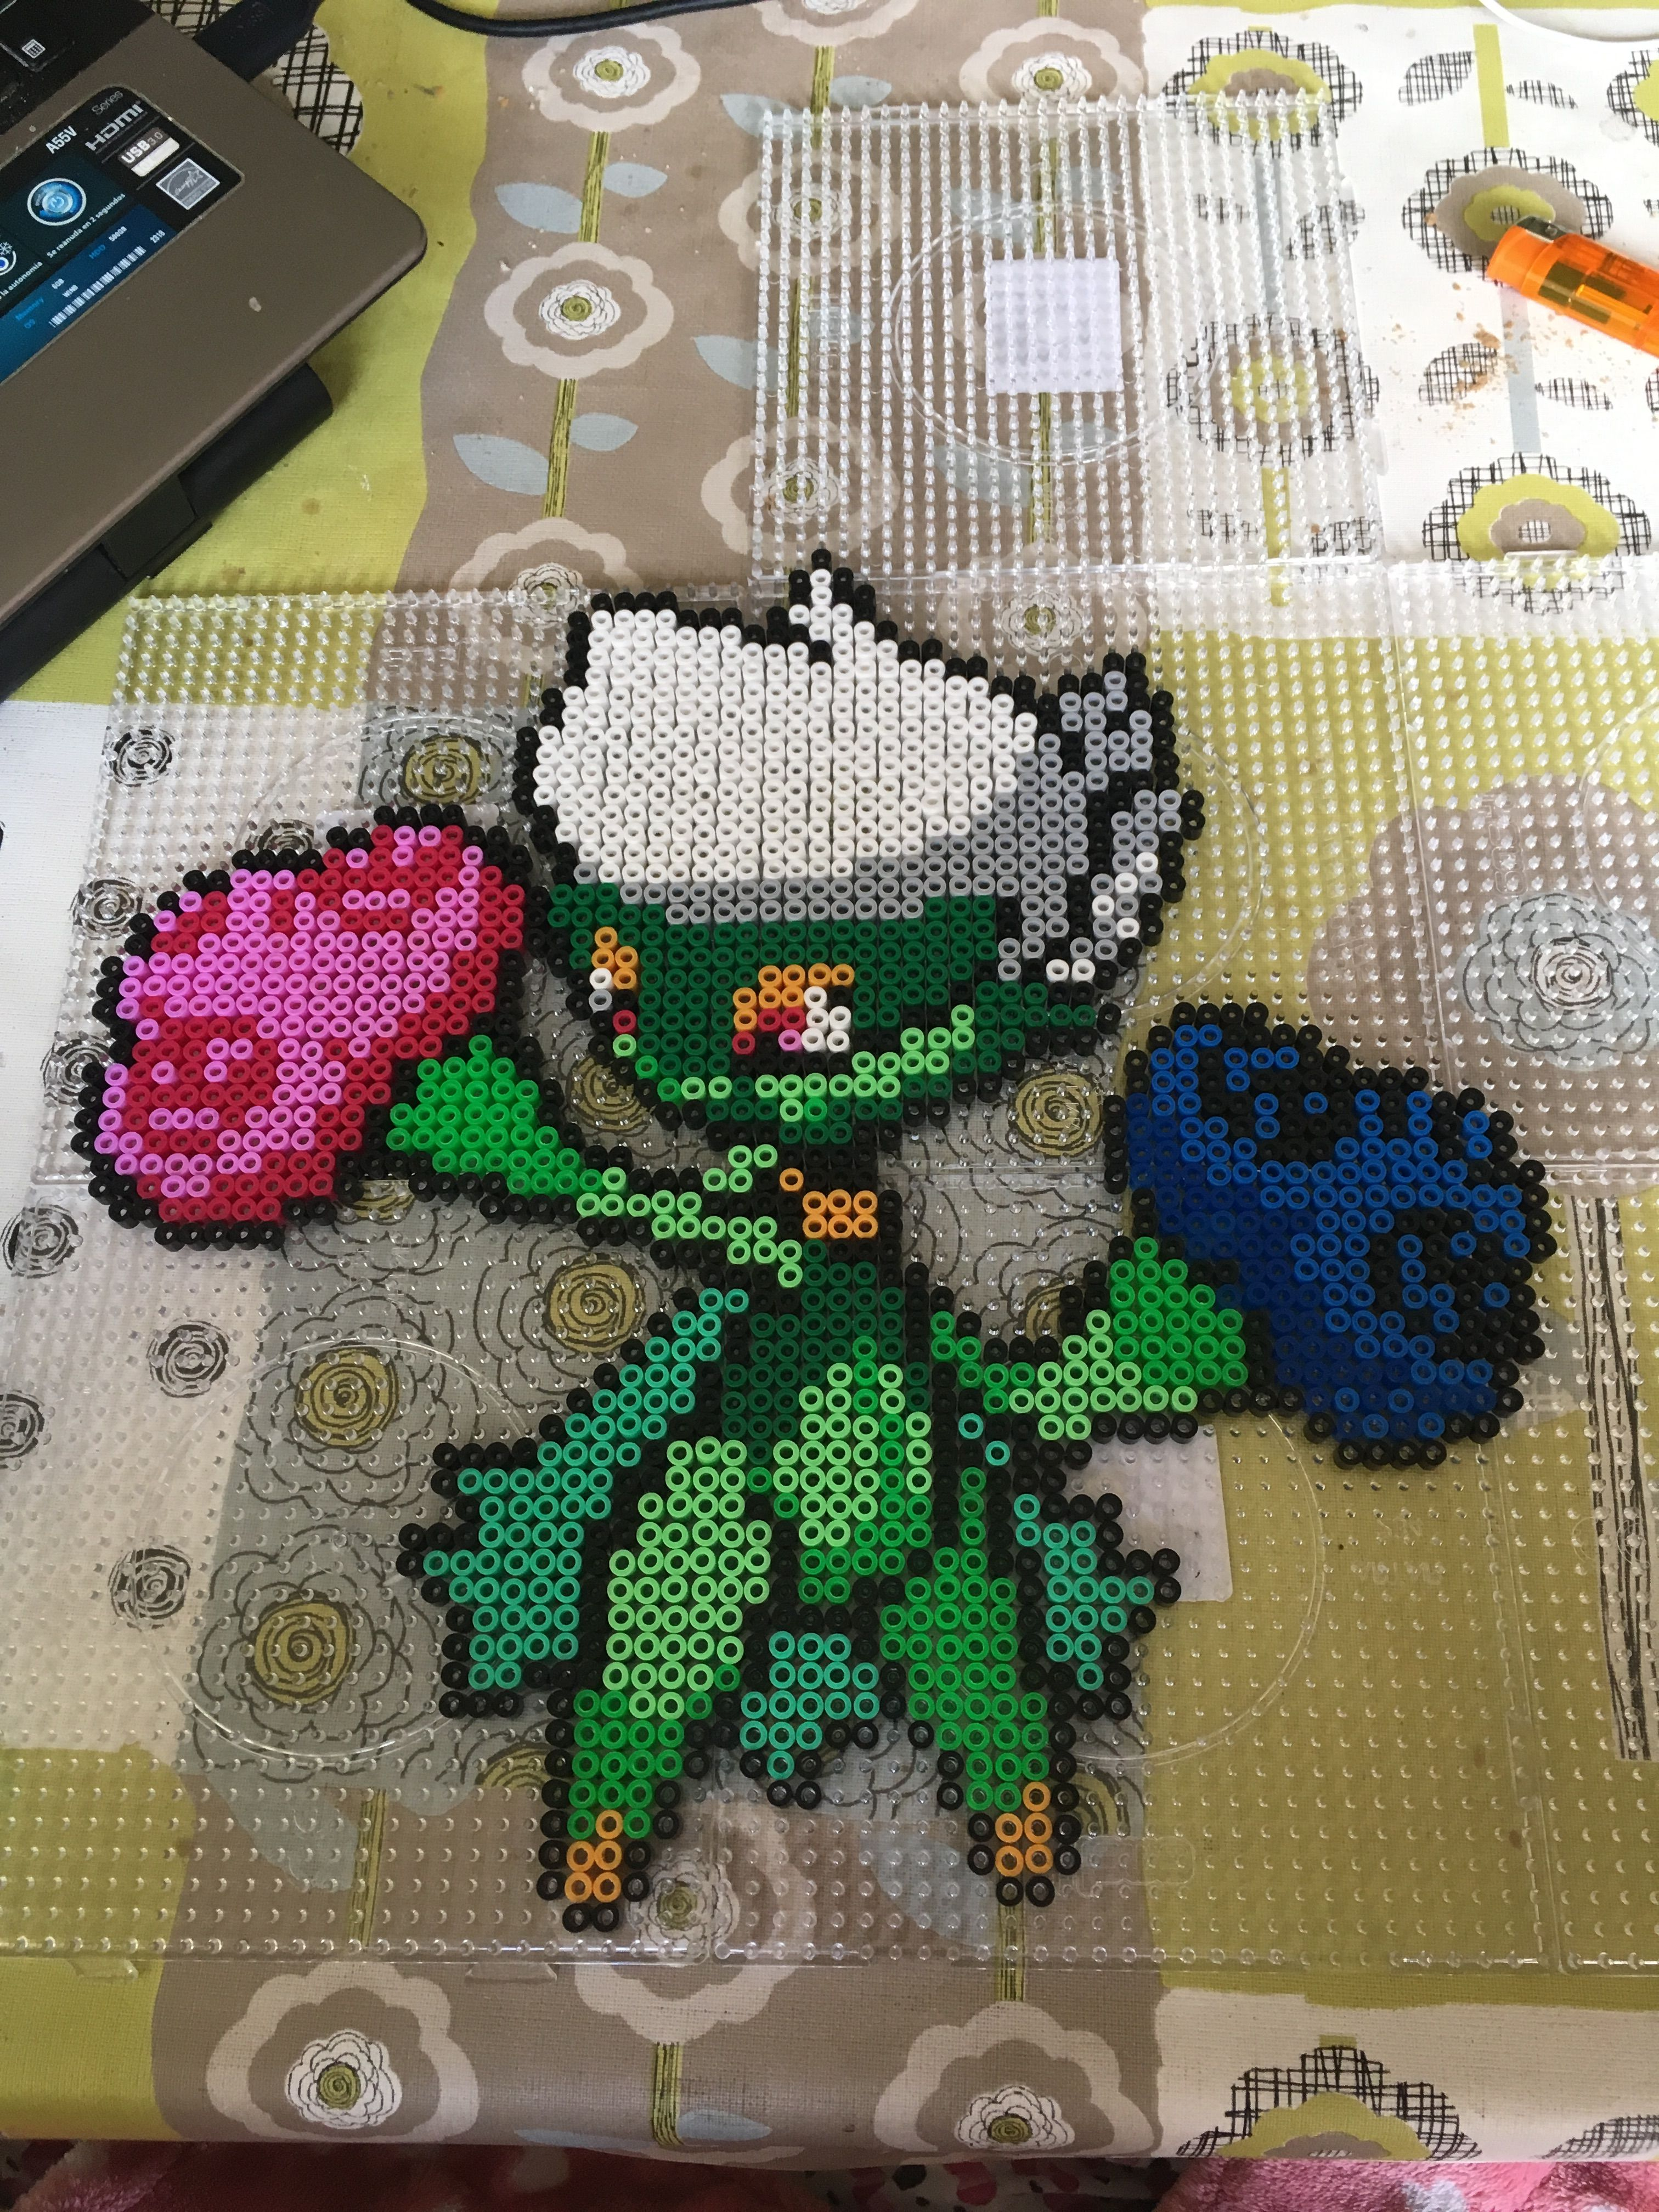 Roserade hama perler by lightning | Pokemon and Digimon